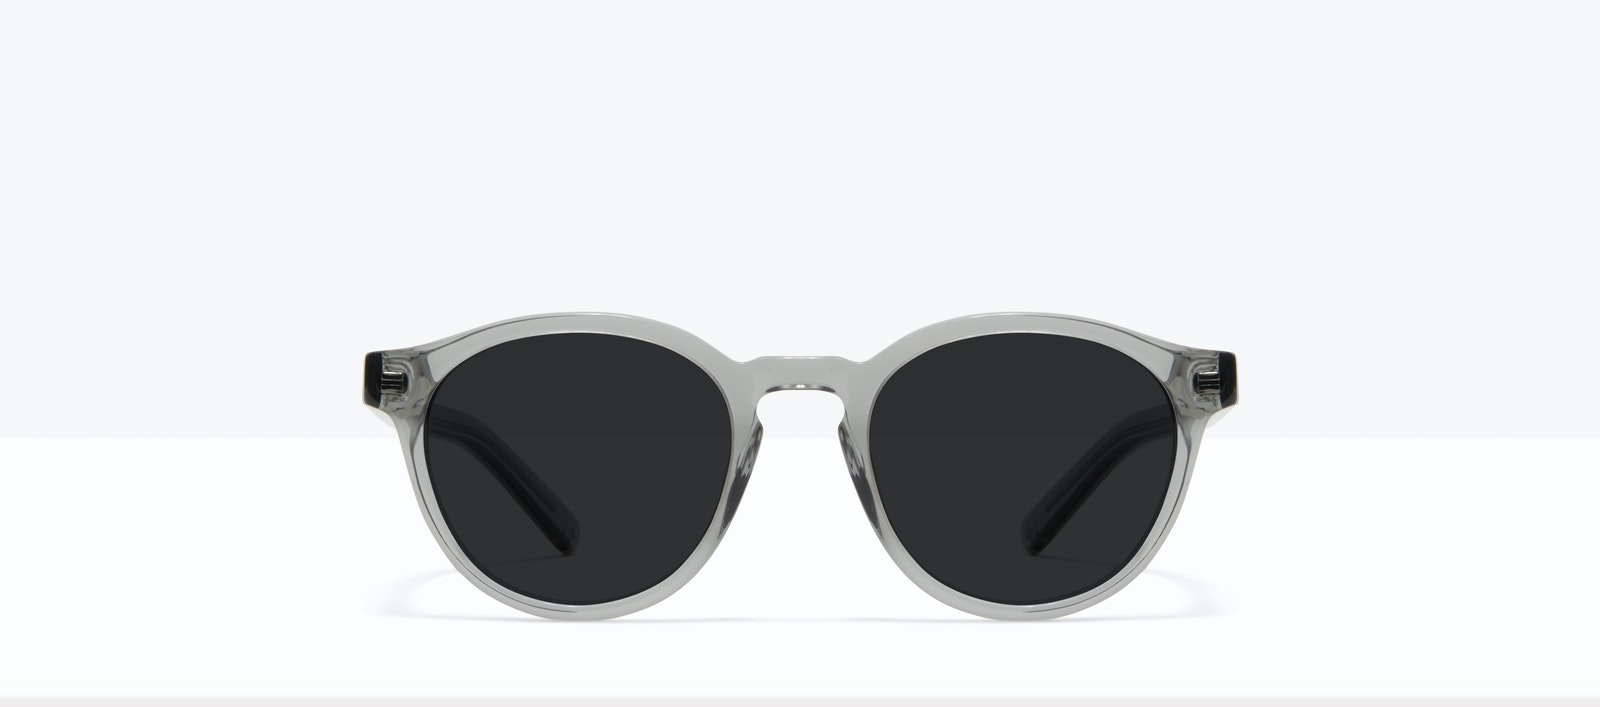 Affordable Fashion Glasses Round Sunglasses Men Gent S Storm Front